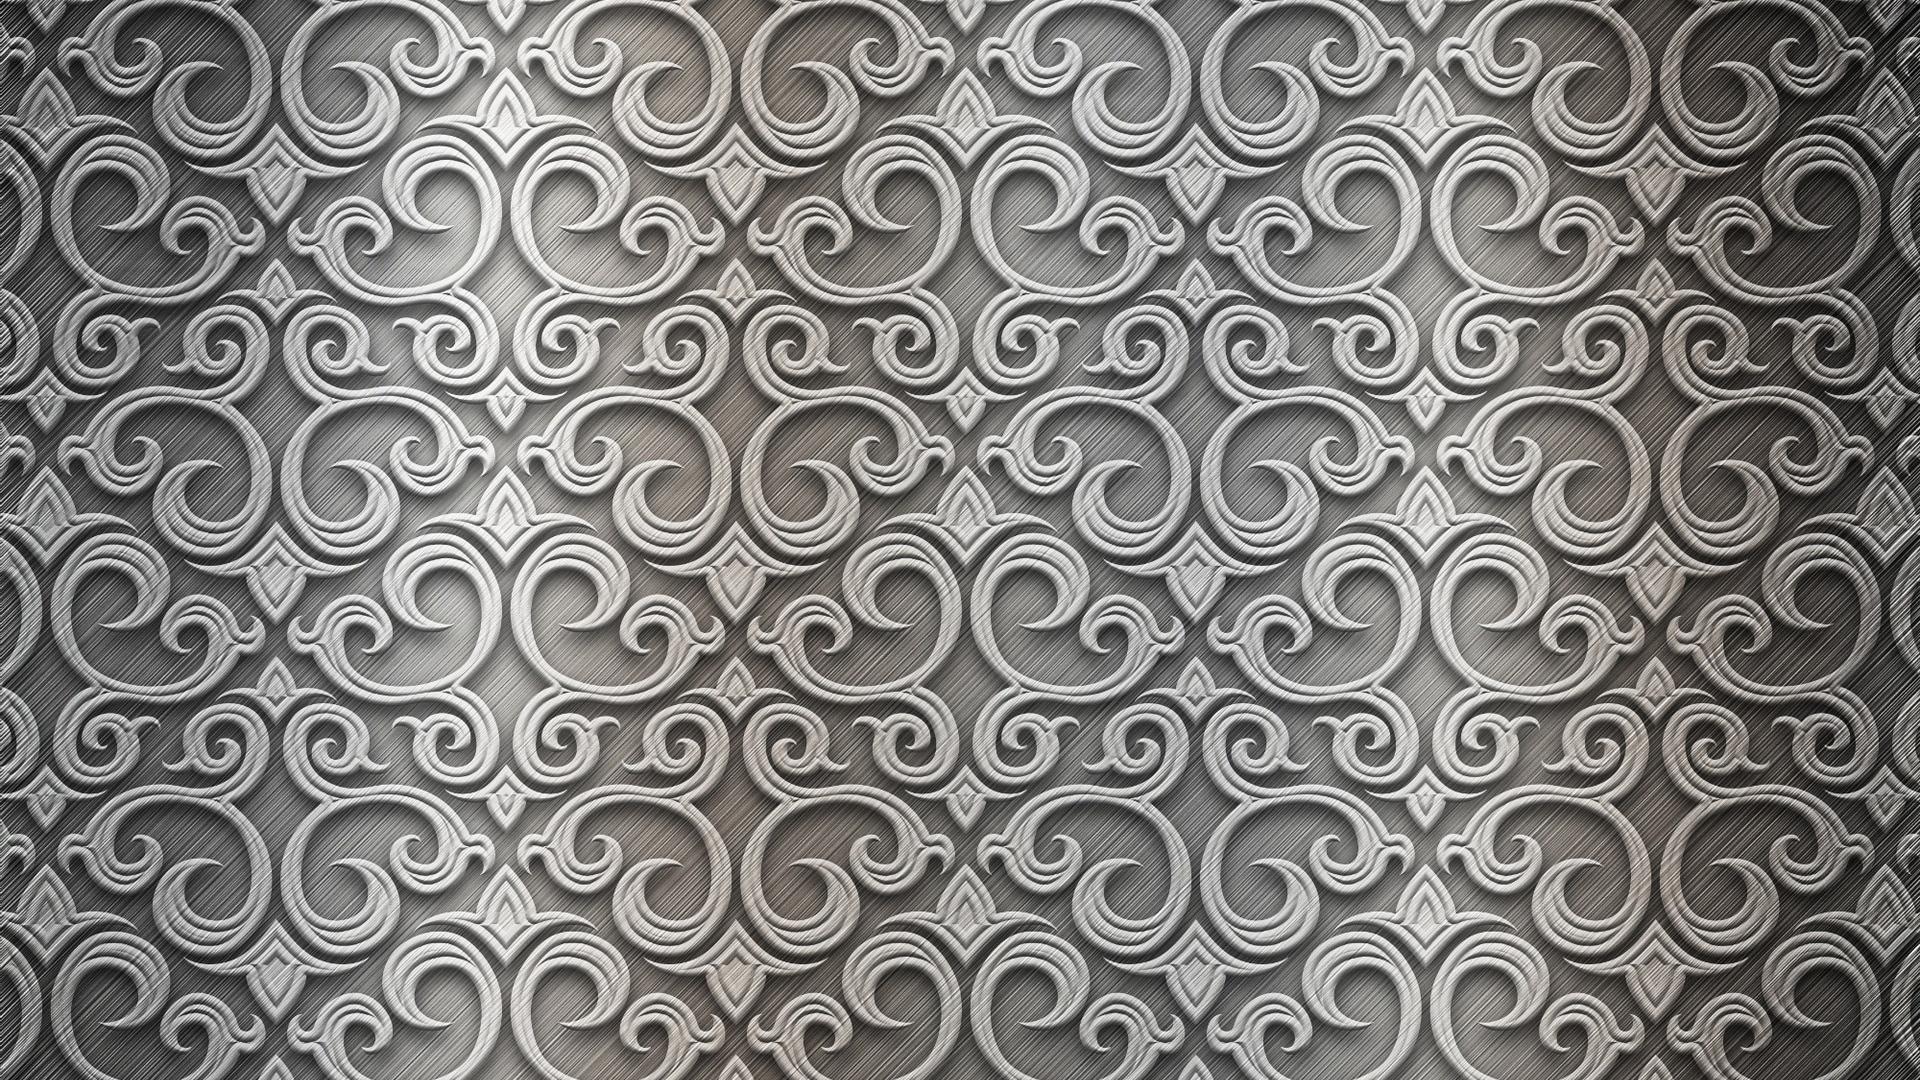 Download Wallpaper 1920x1080 Patterns Wavy Background Texture